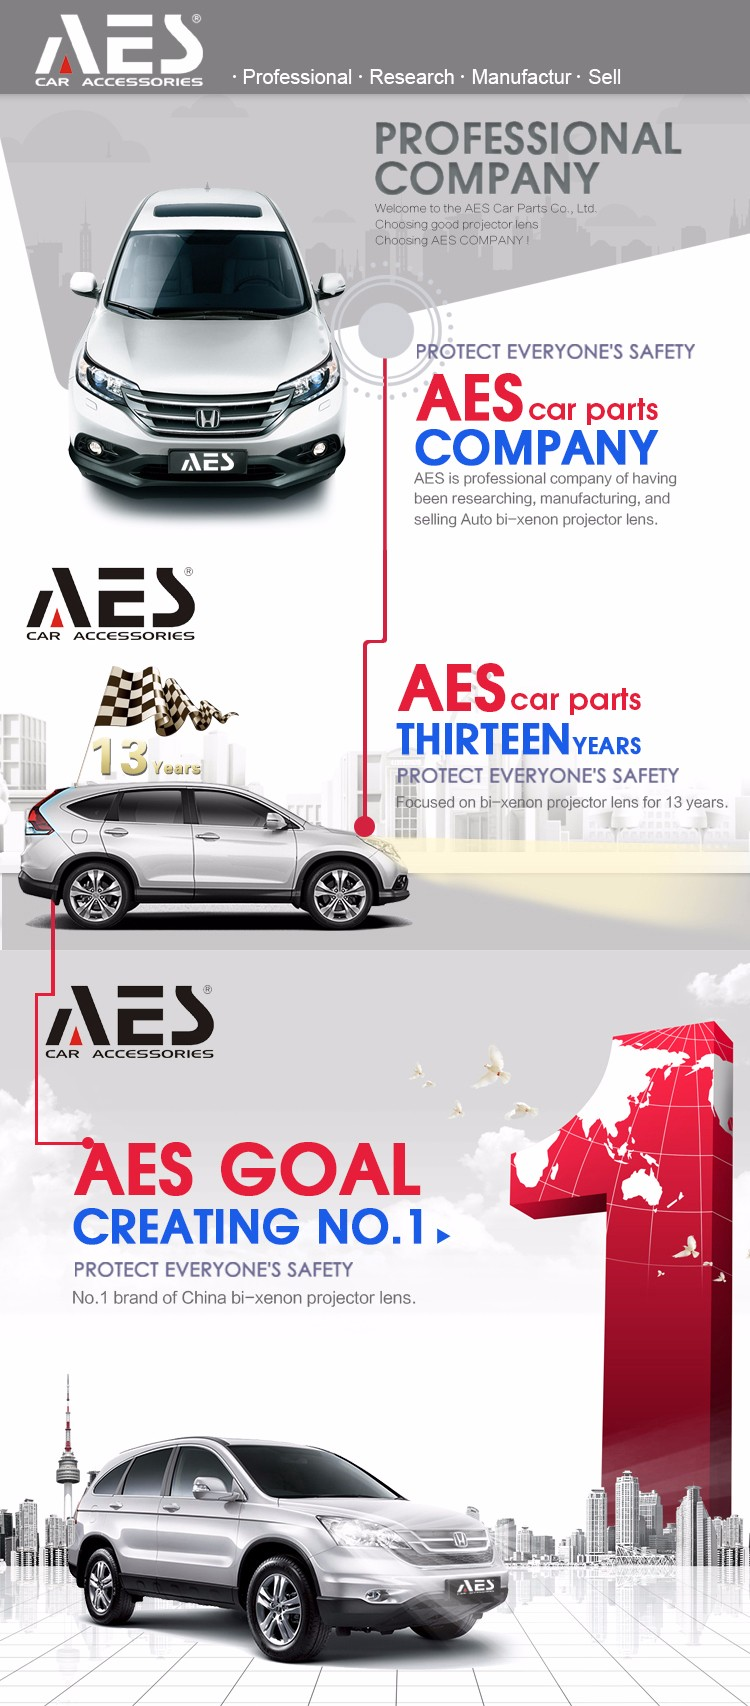 Aes Led Car Headlight Bulbs Tail Light Auto Parts Lighting System